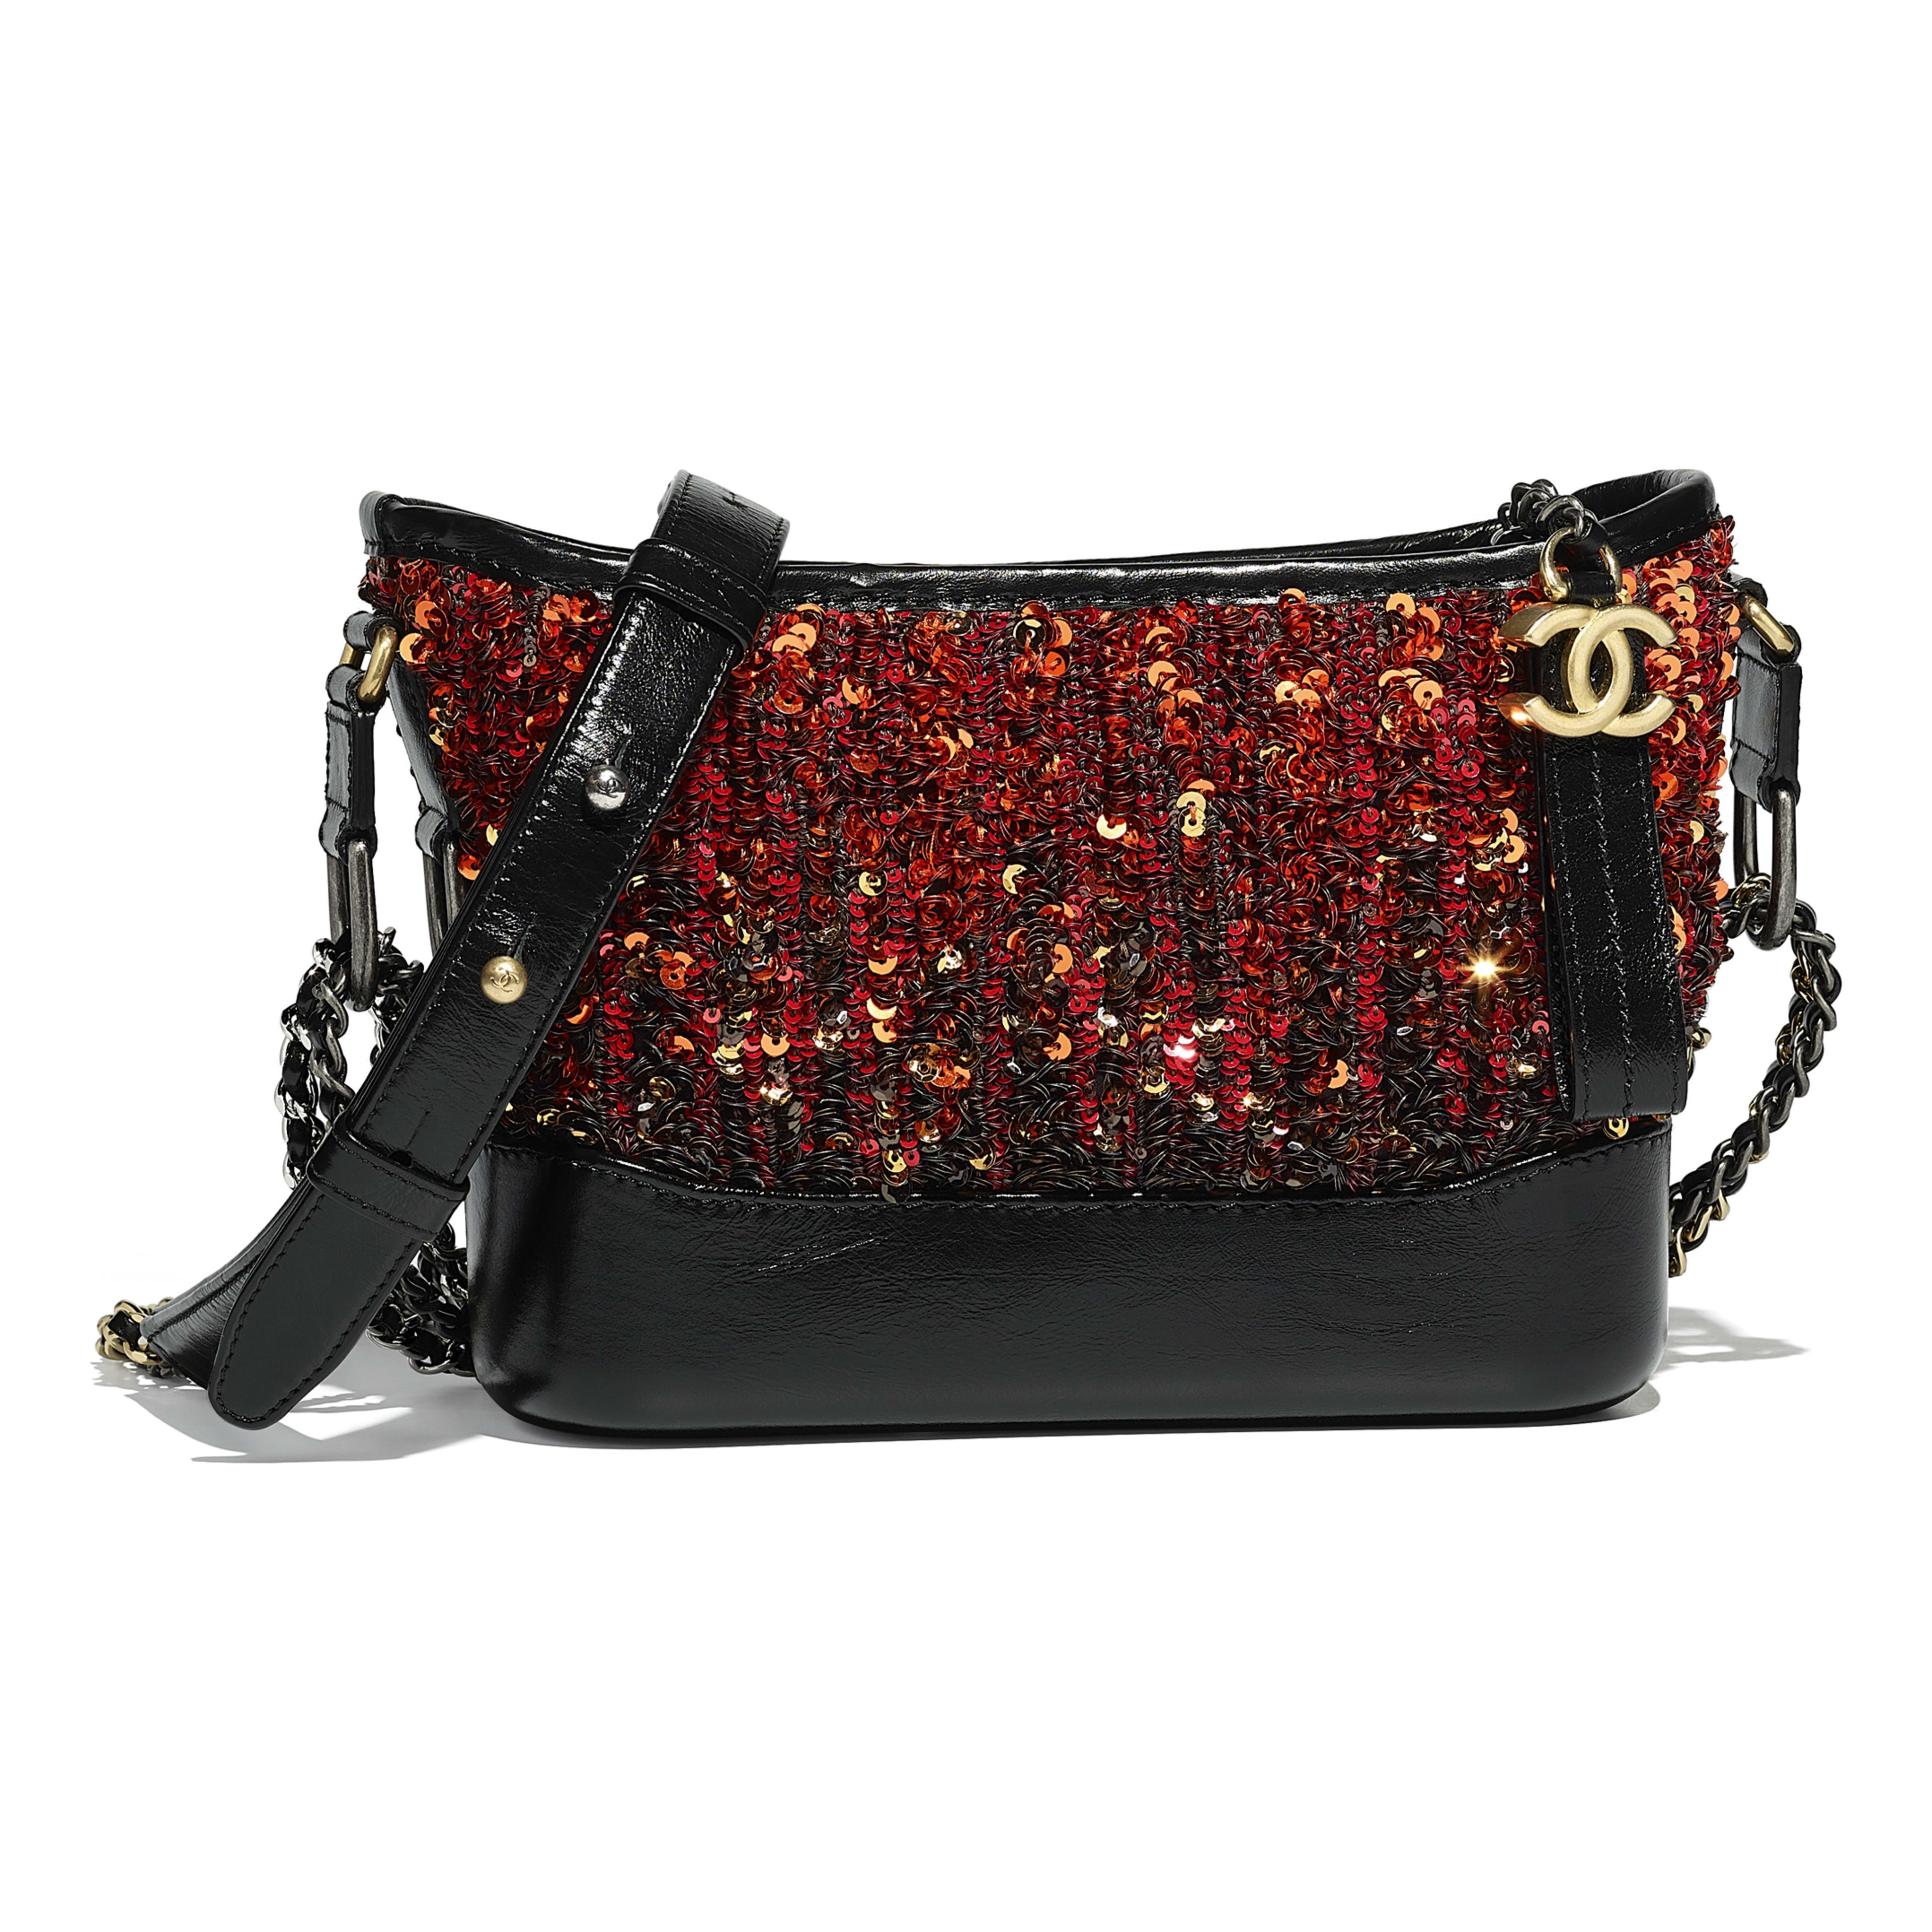 Chanel S Gabrielle Small Hobo Bag